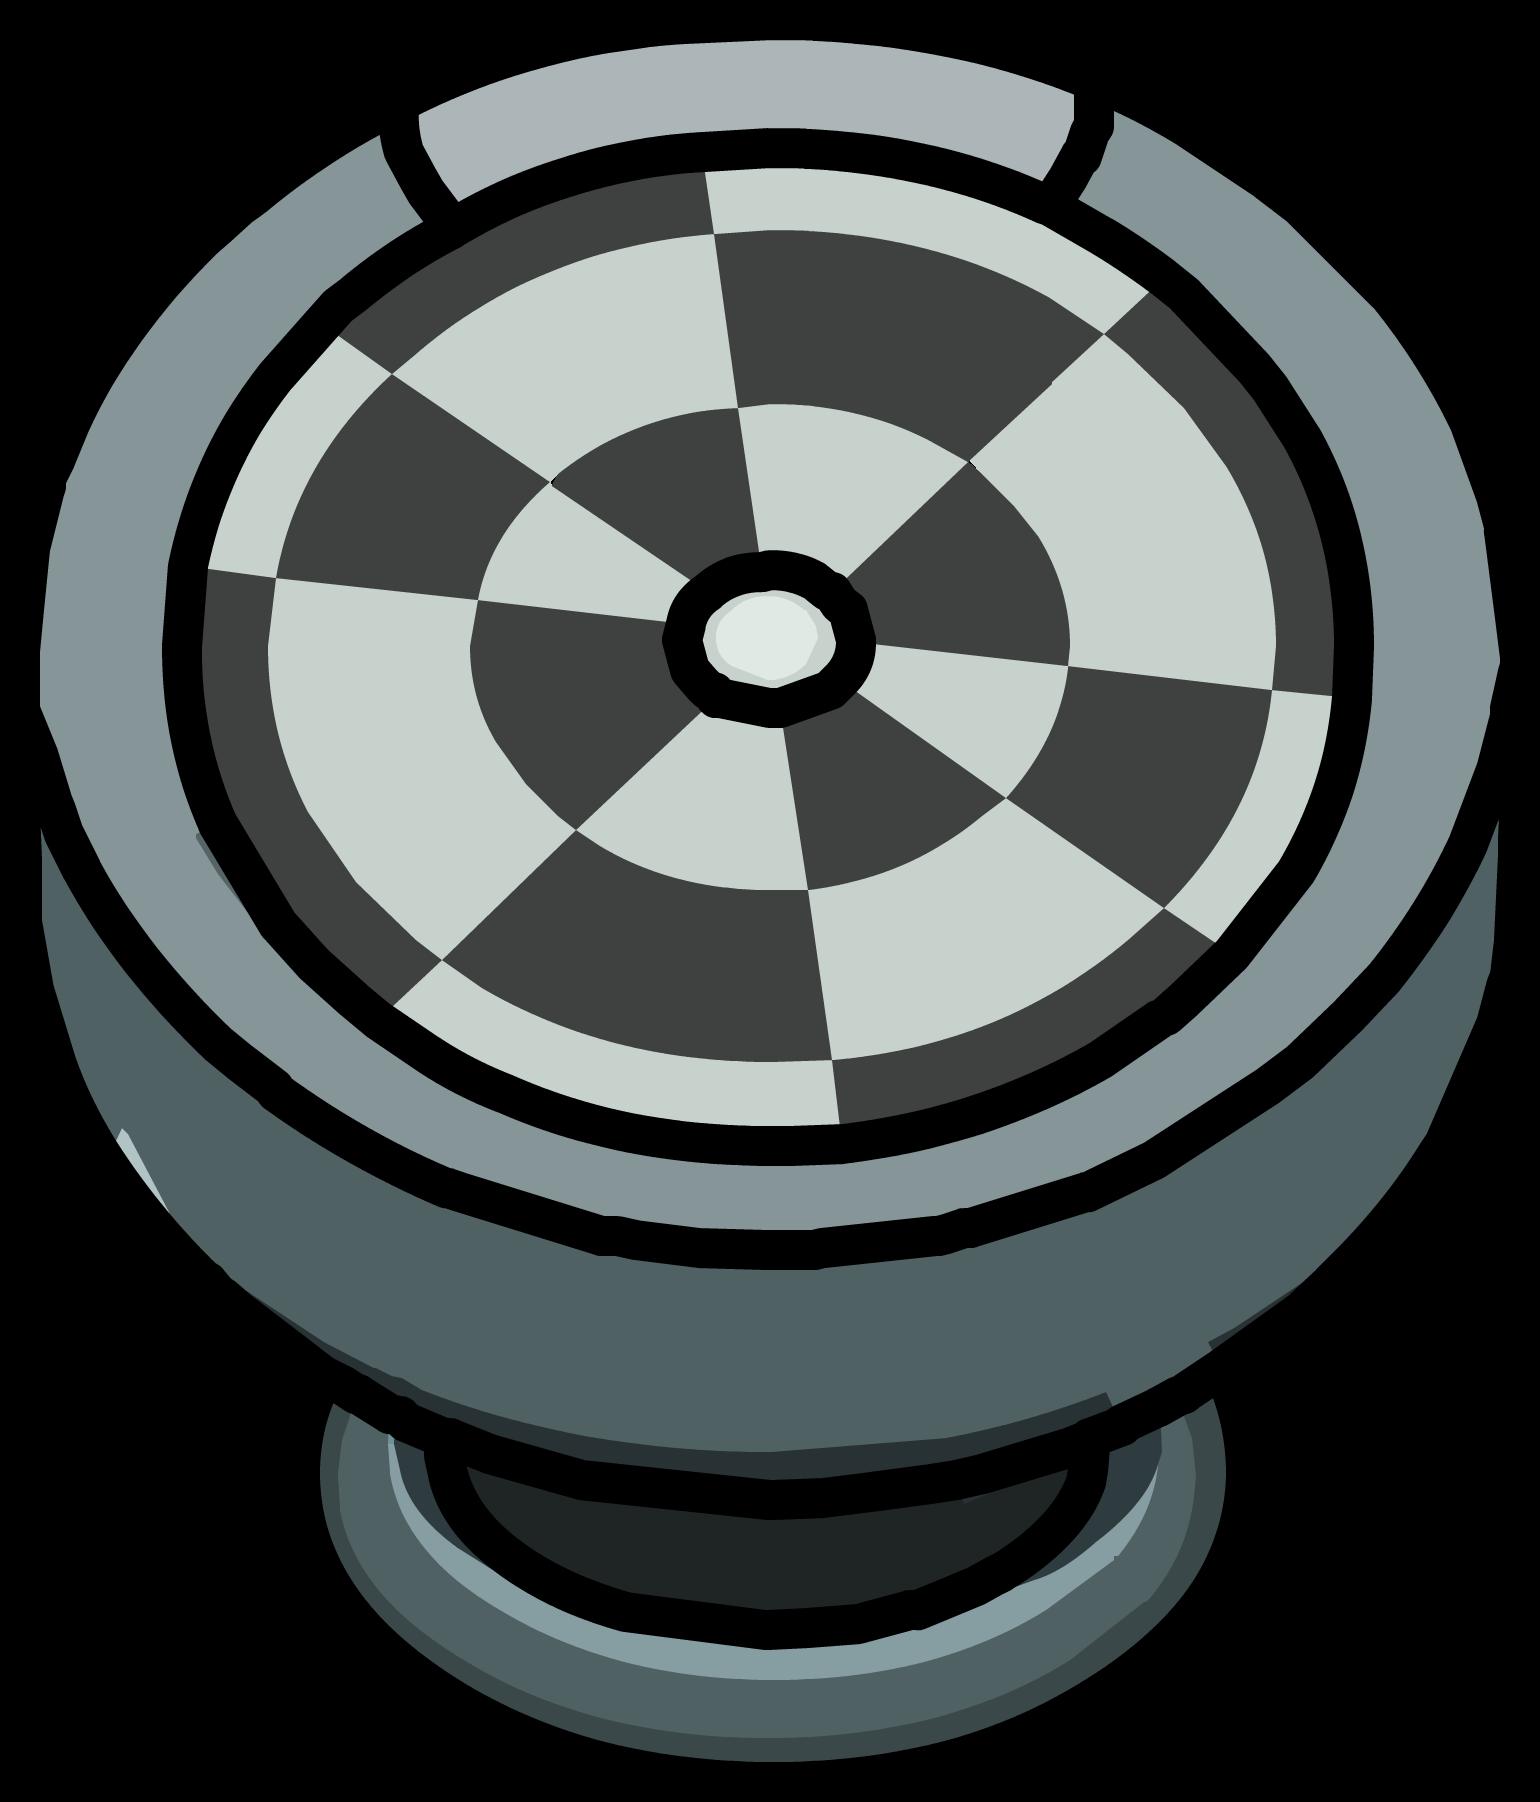 Star wars dejarik clipart picture library download Dejarik Set | Club Penguin Wiki | FANDOM powered by Wikia picture library download